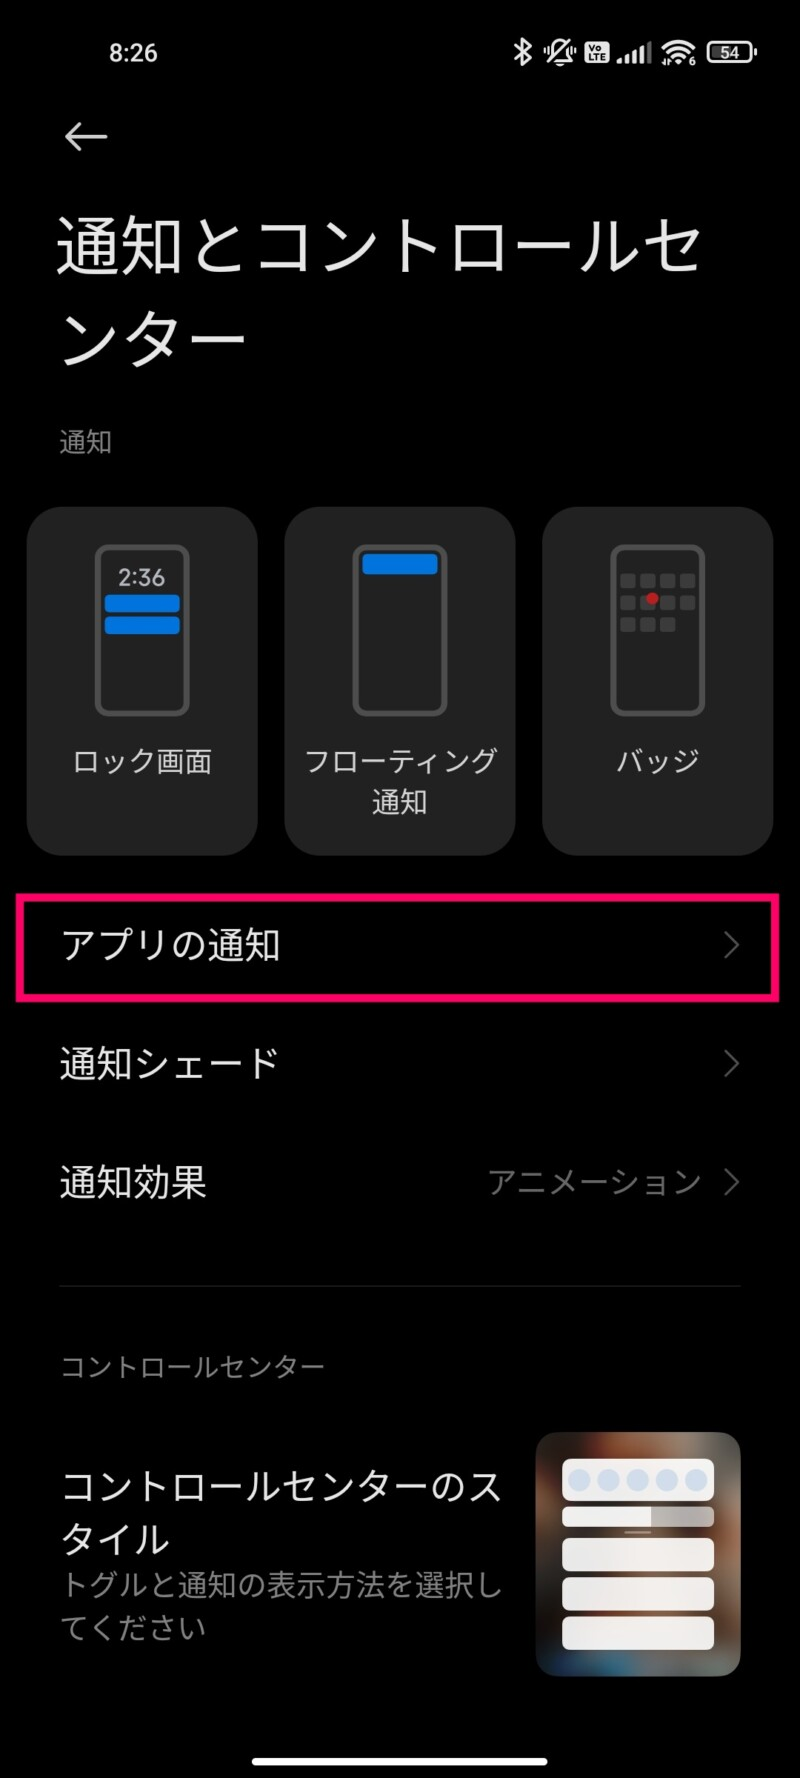 Mi 11 Lite 5Gのアプリの通知のオン・オフを個別に設定する方法3